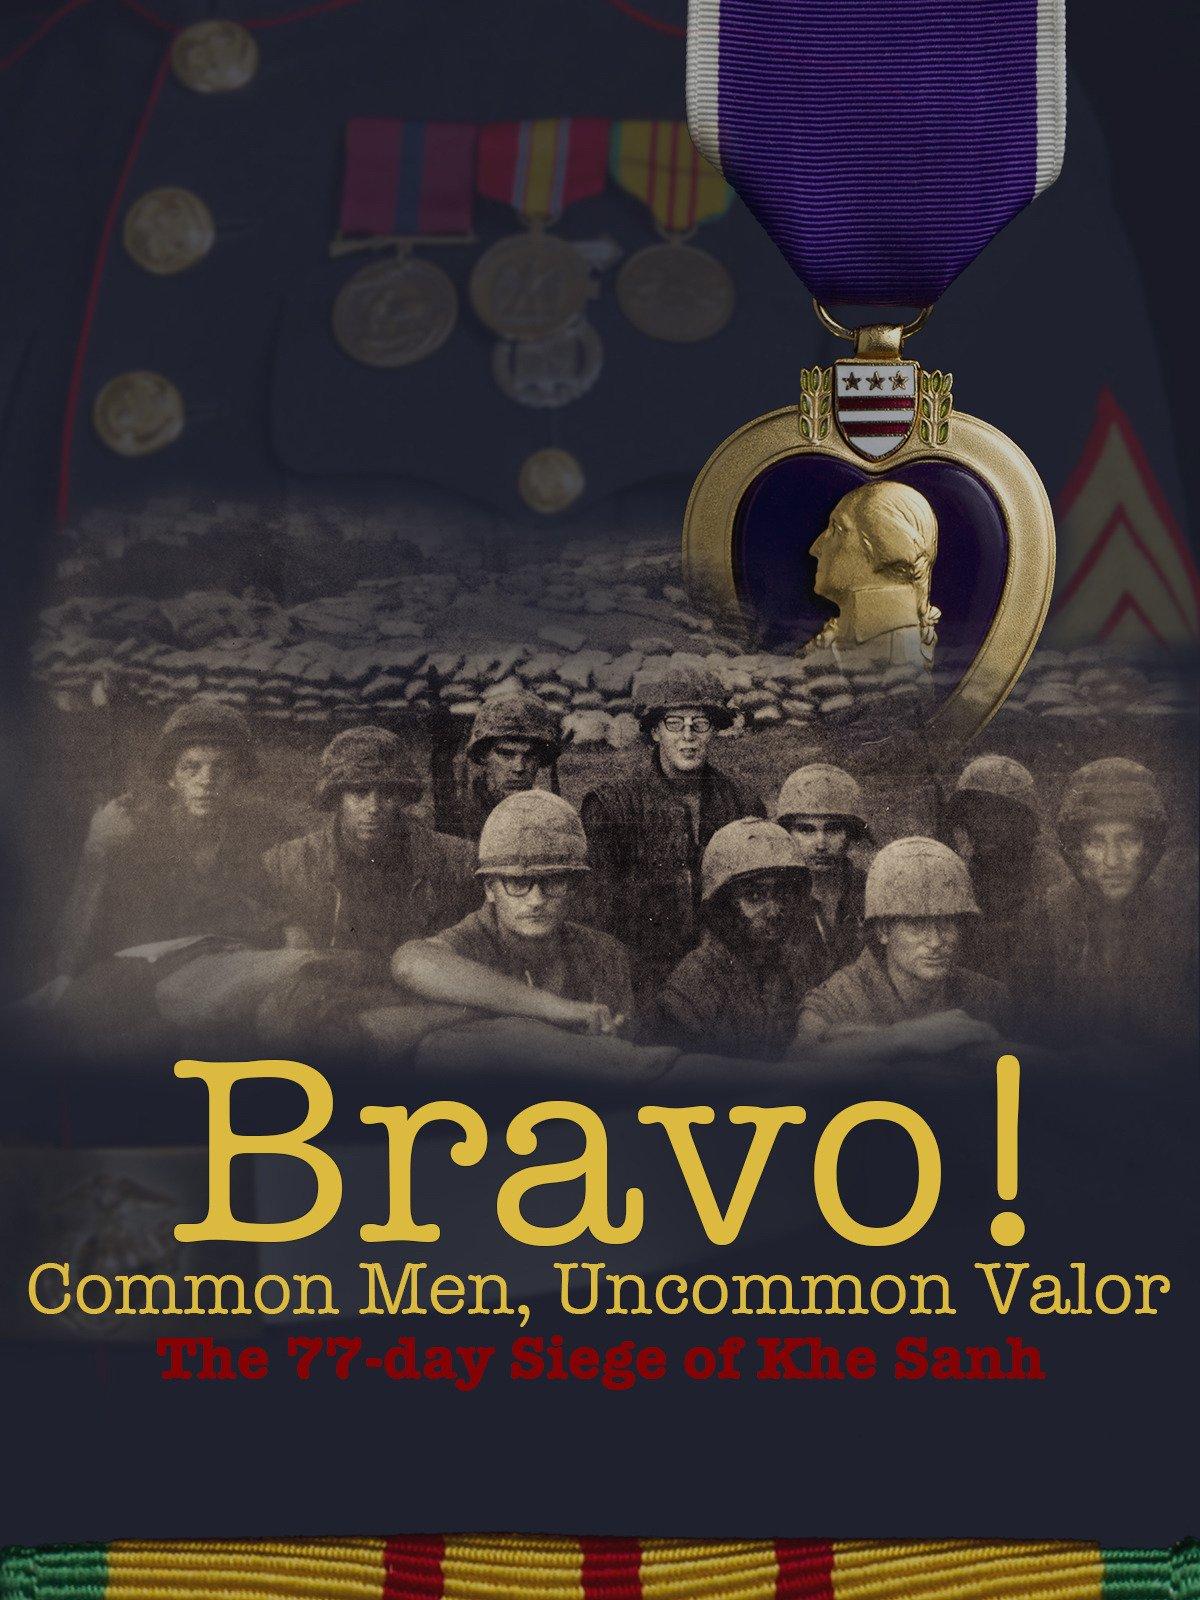 Bravo! Common Men, Uncommon Valor by